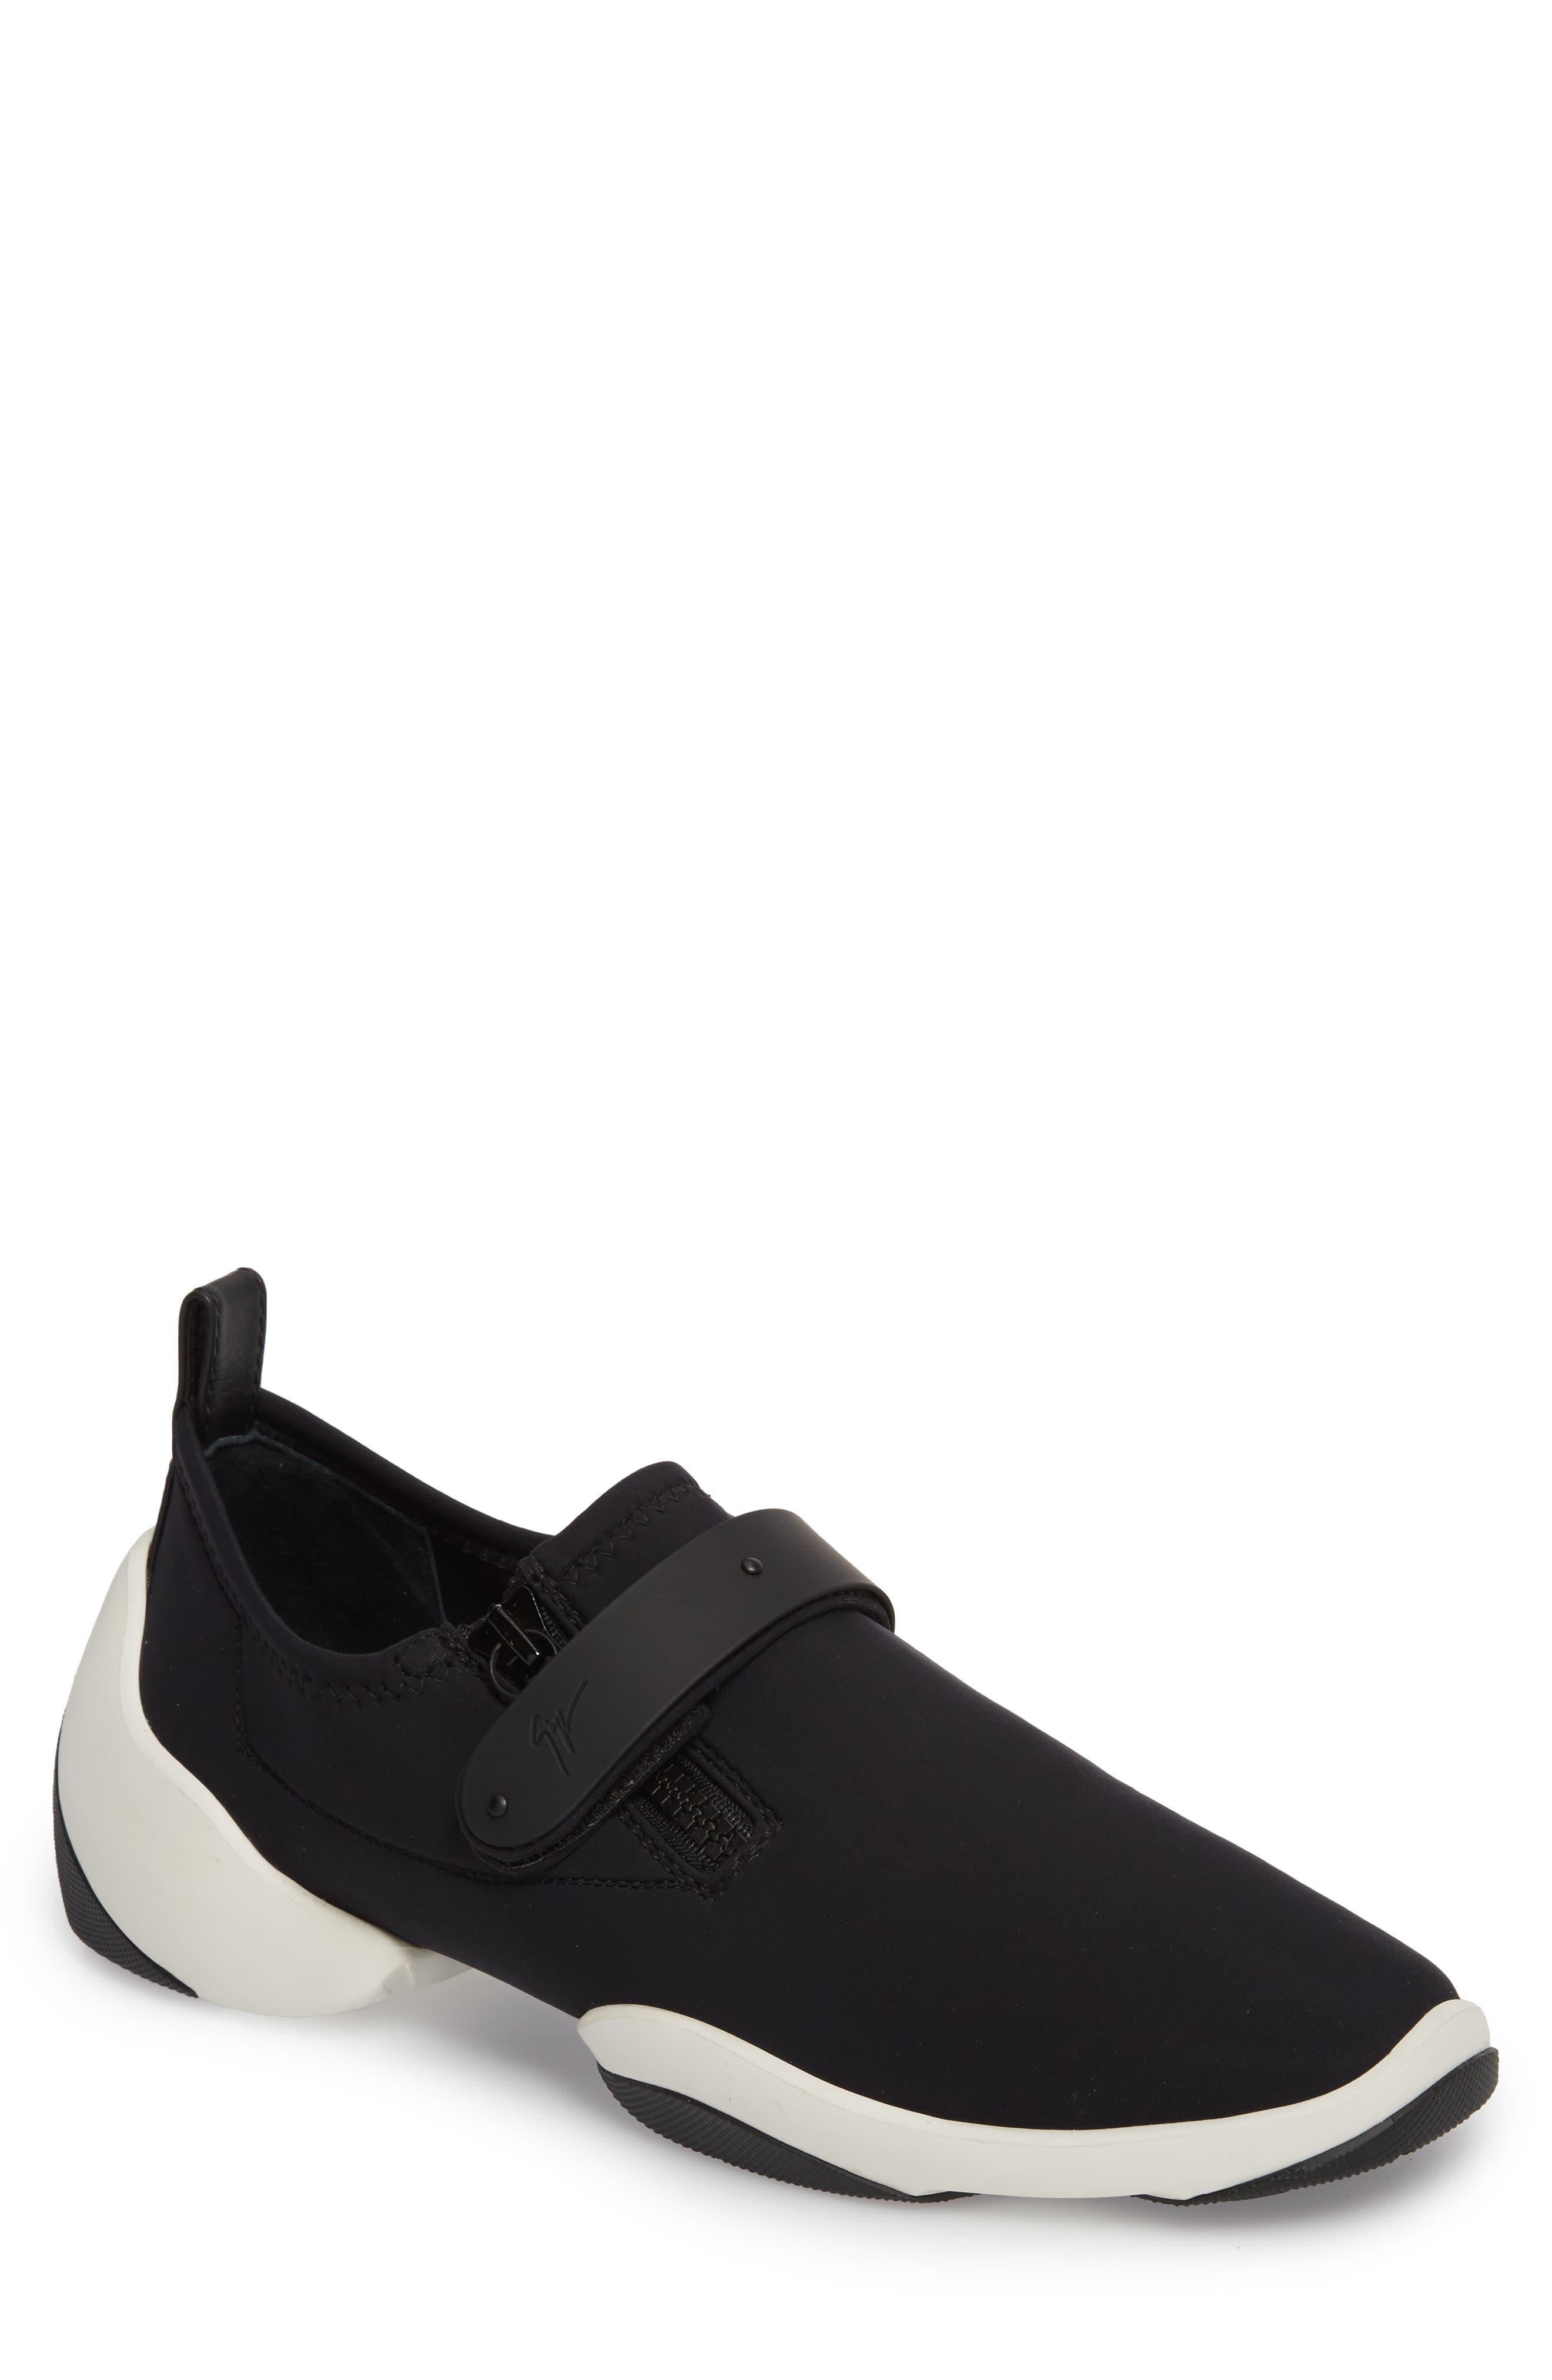 Scuba Strap Sneaker,                             Main thumbnail 1, color,                             001